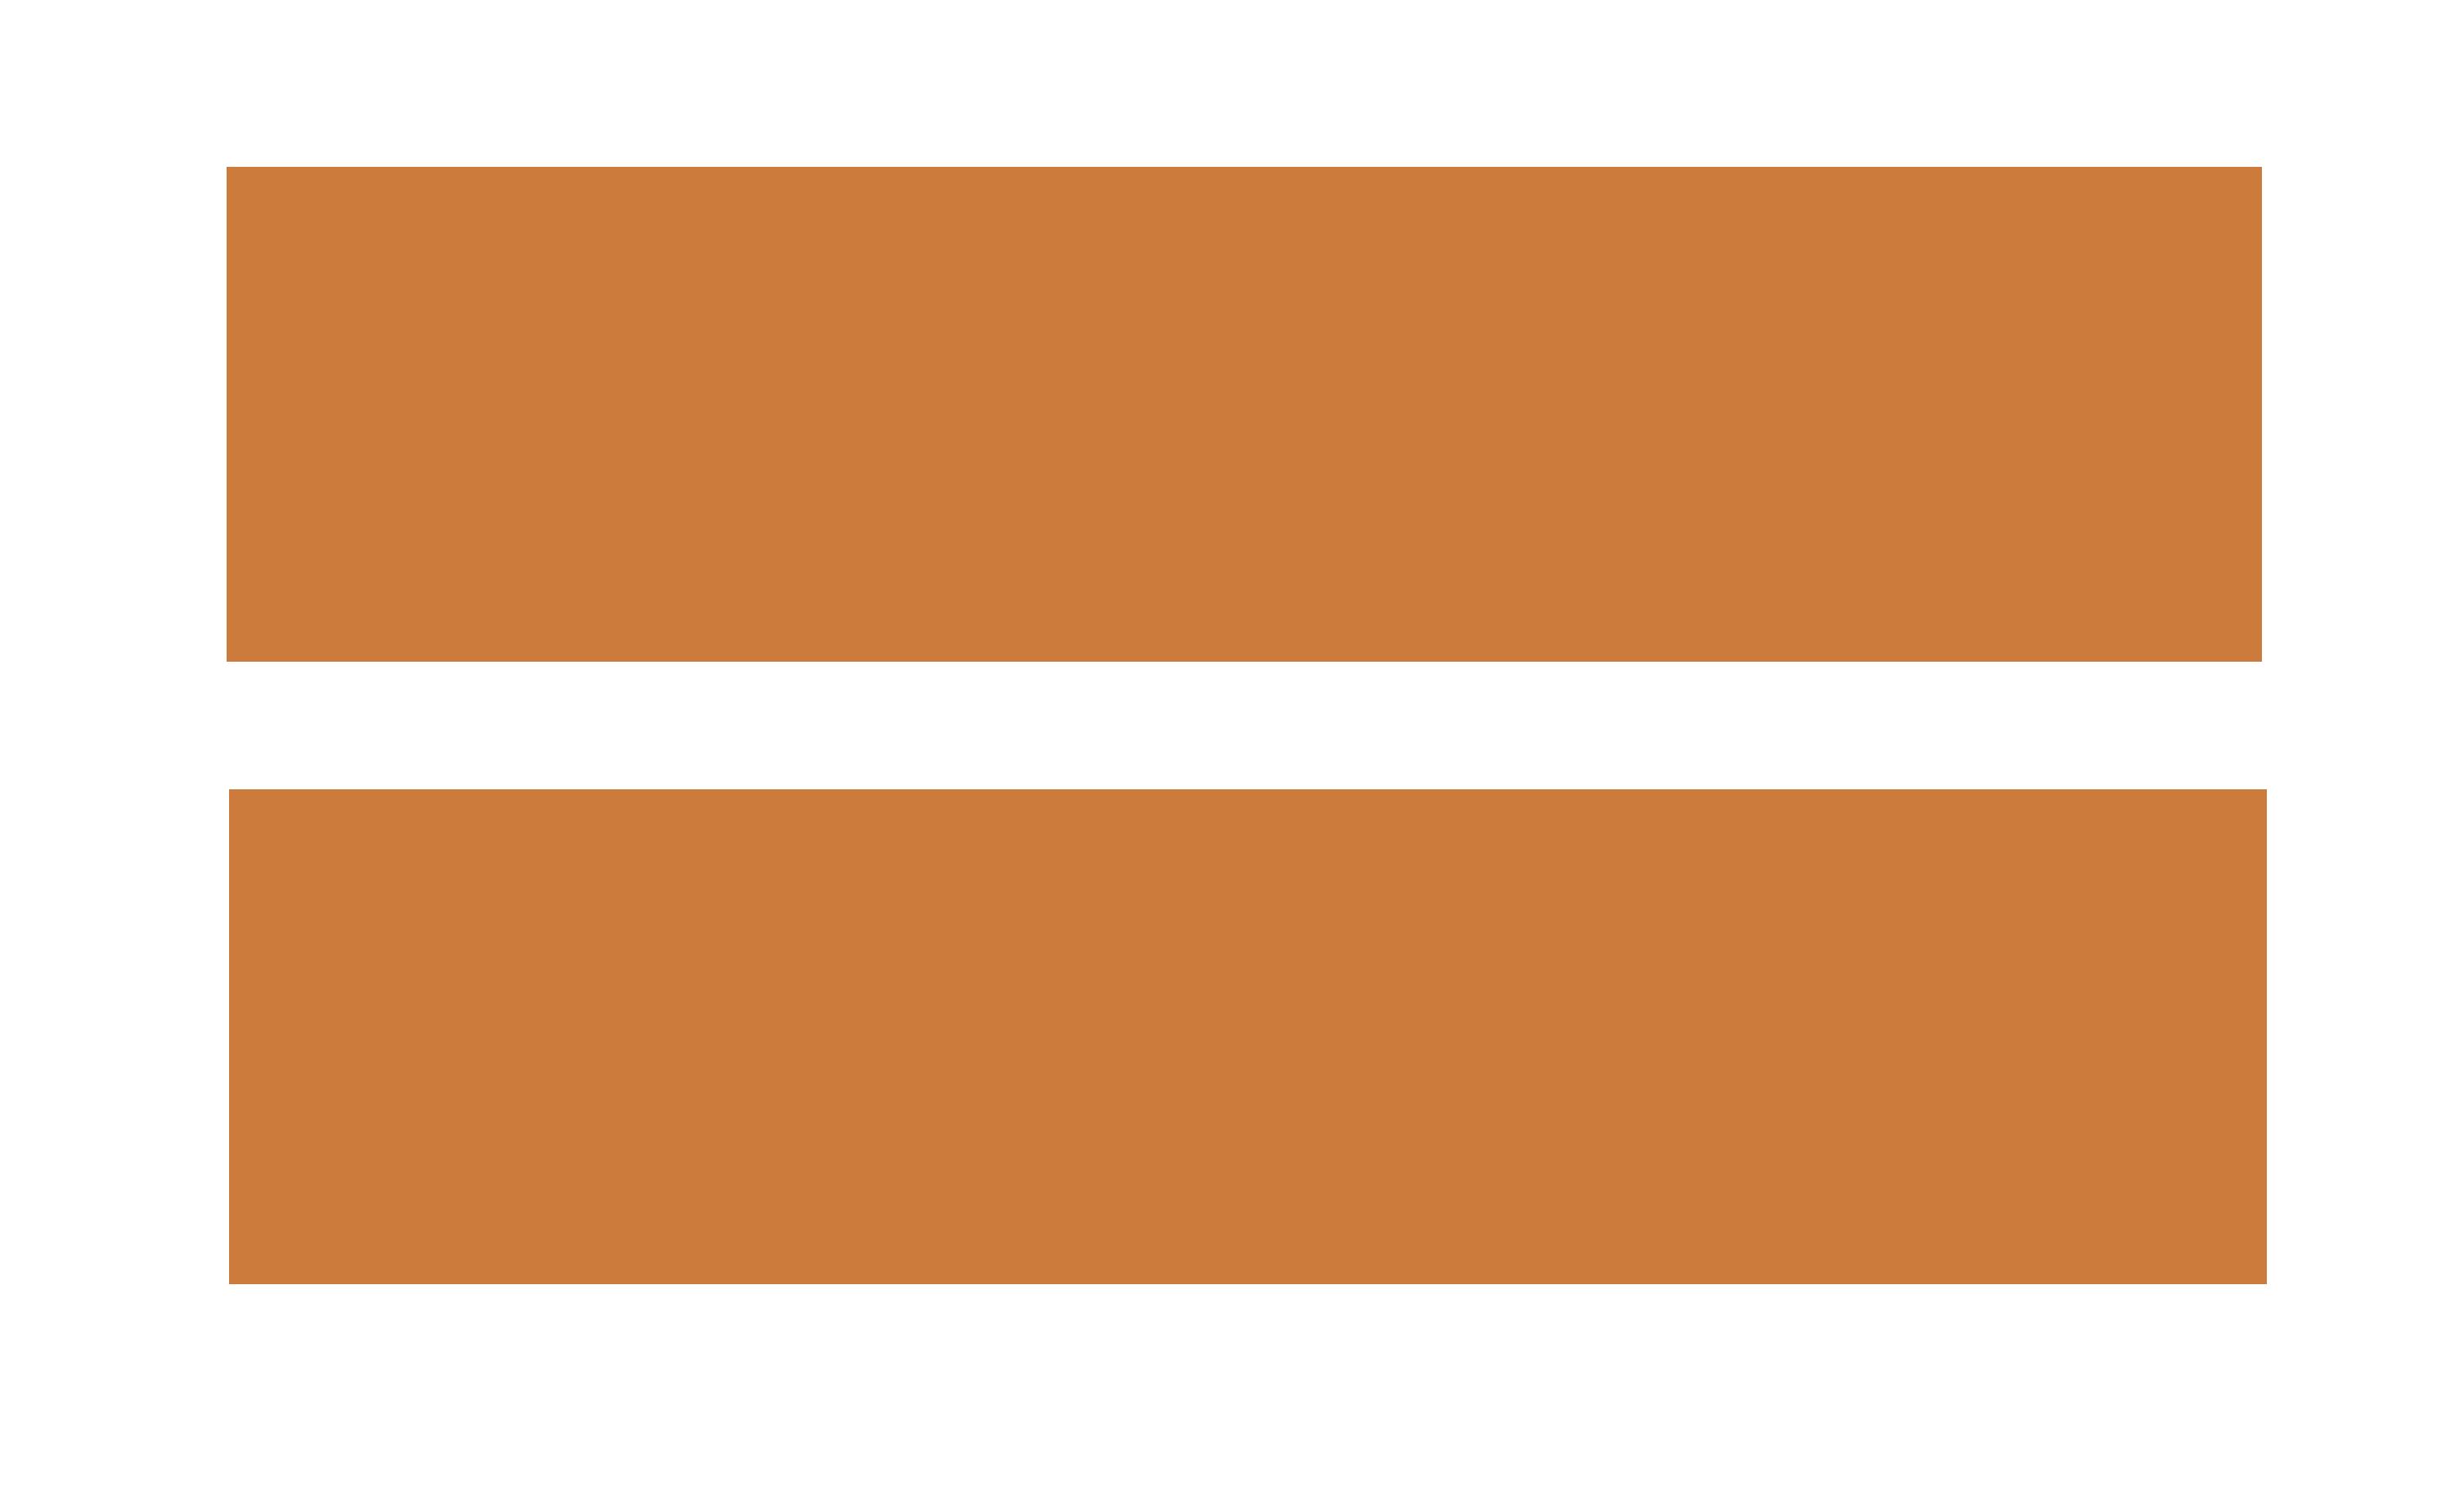 Mattfredm